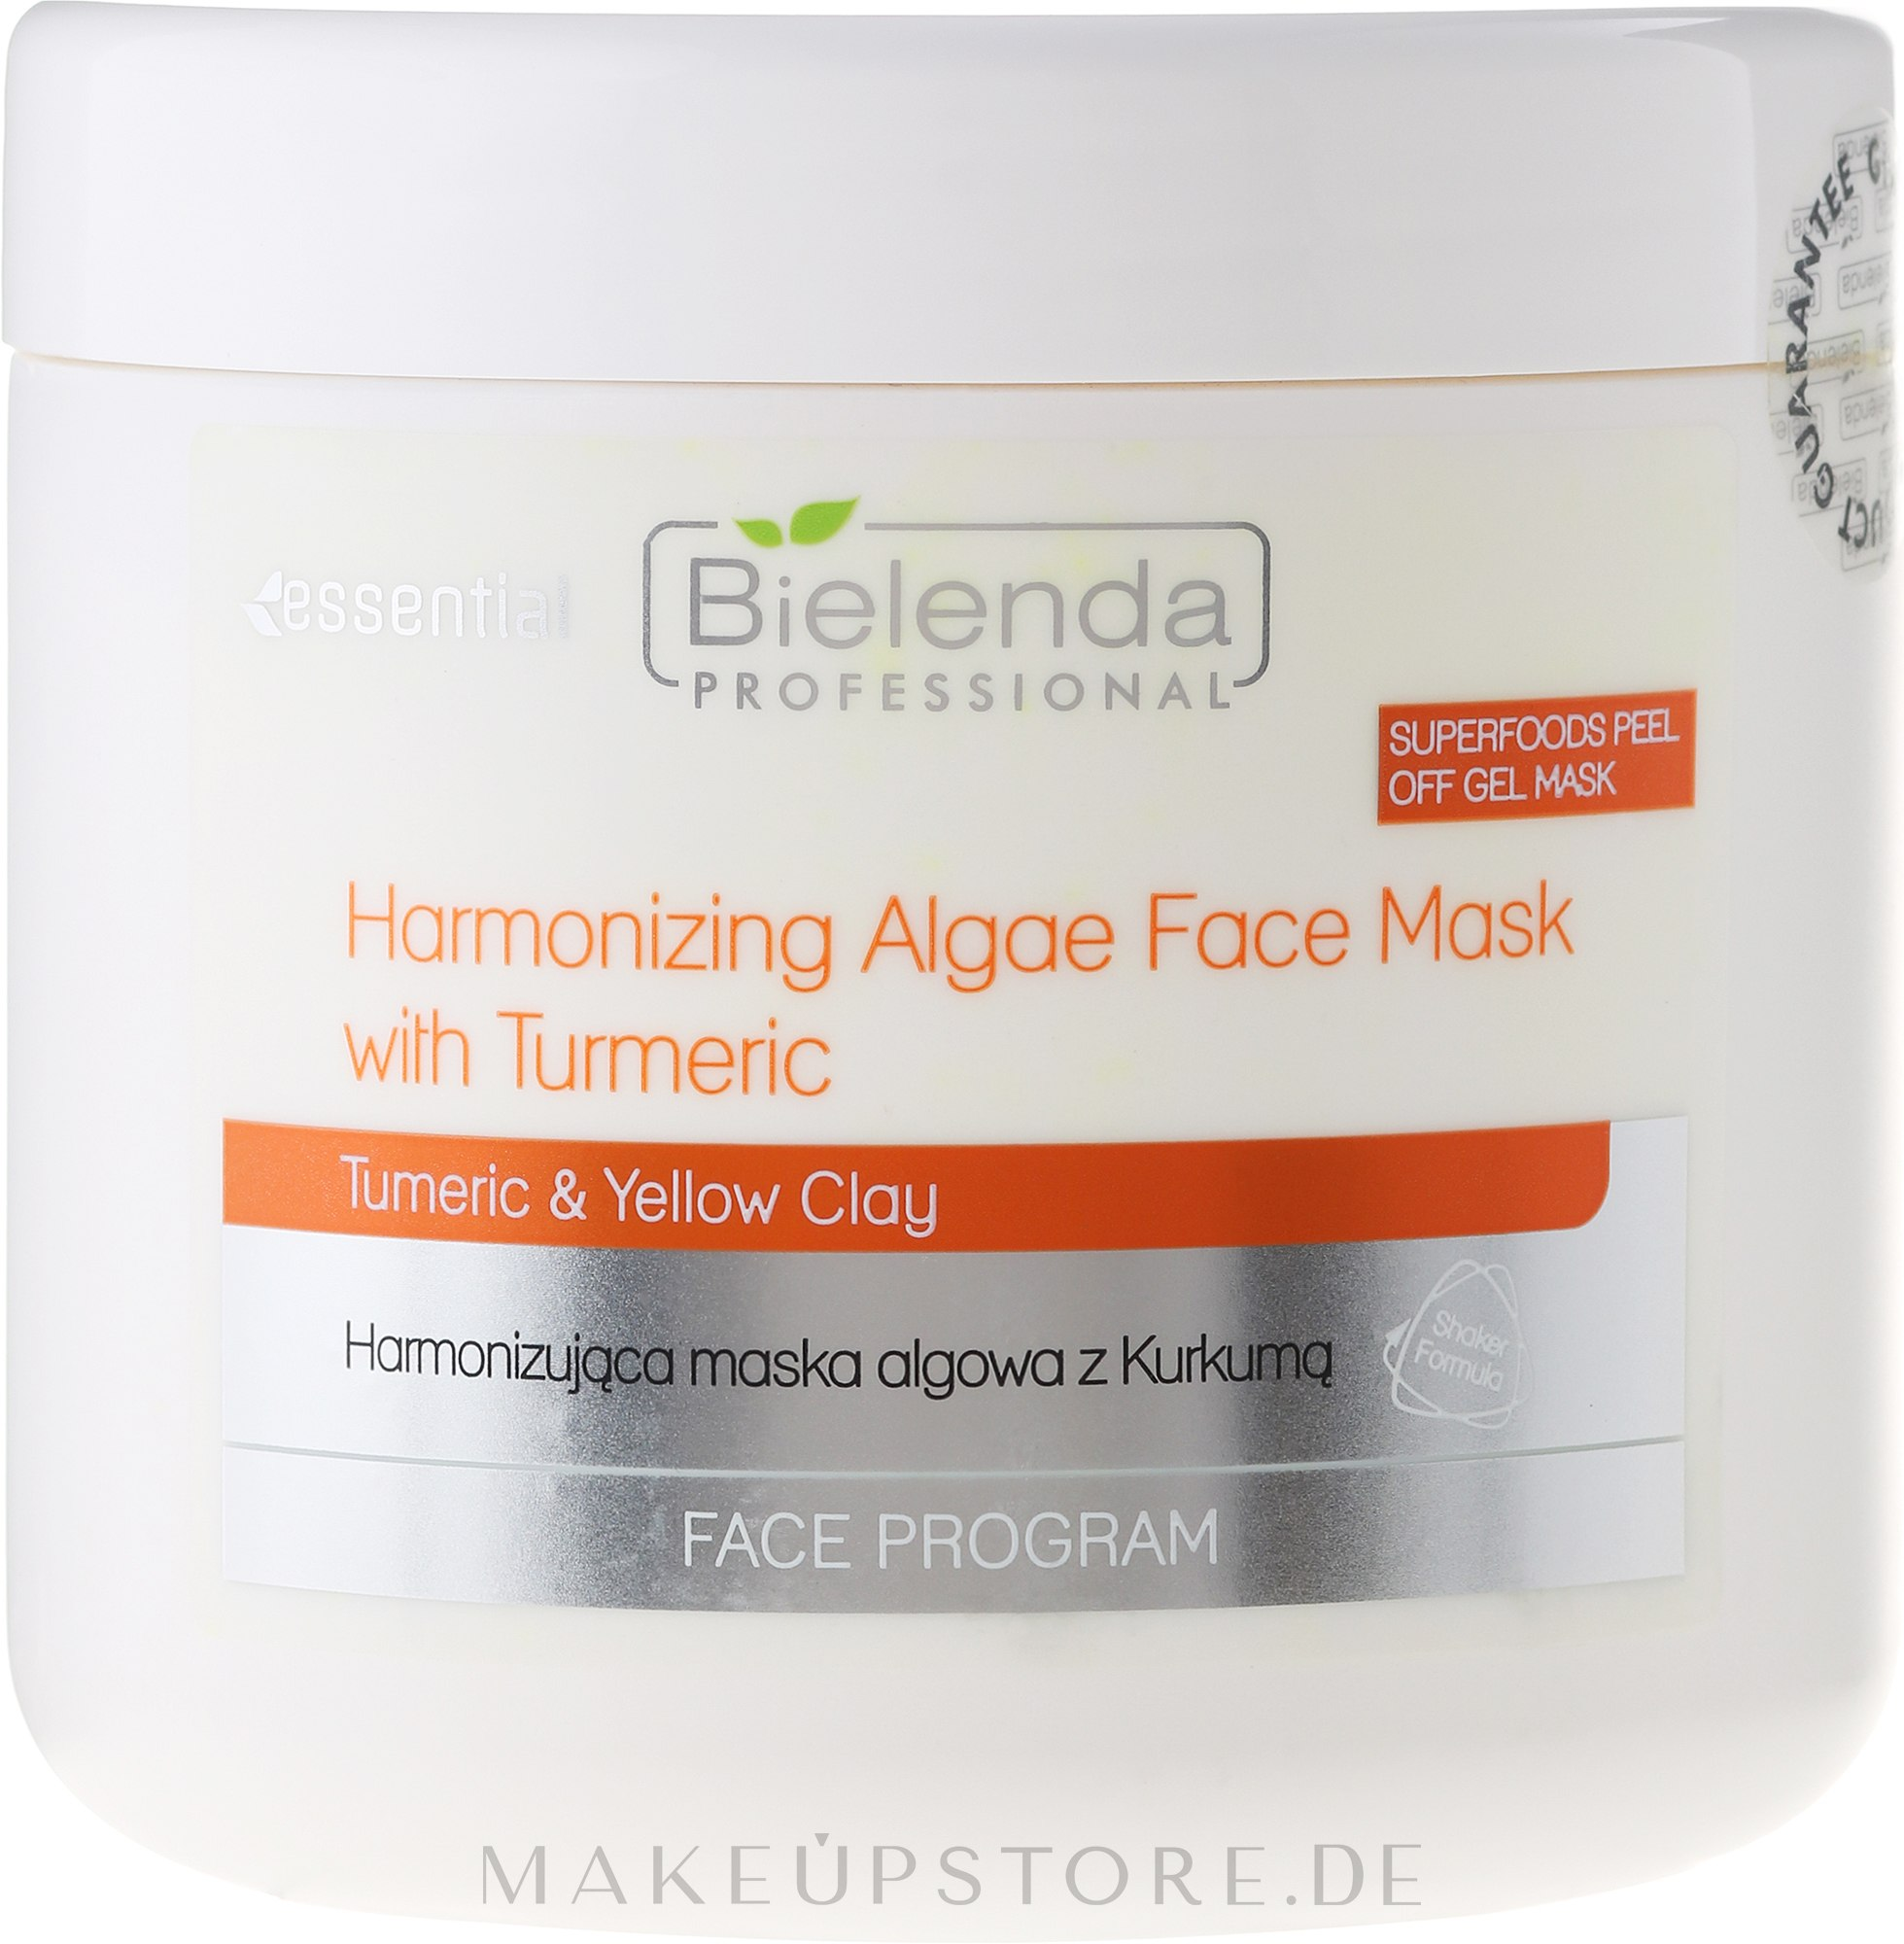 Regenerierende Kurkuma-Gesichtsmaske für strahlende Haut - Bielenda Professional Face Program Harmonizing Algae Face Mask With Turmeric — Bild 200 g